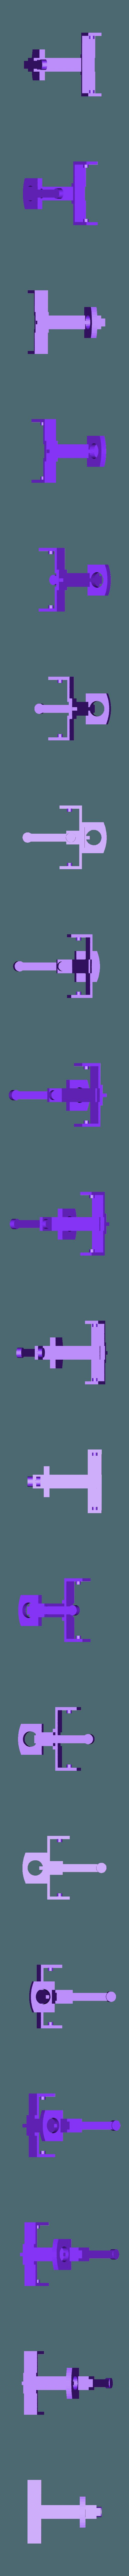 Rfuta3.stl Download free STL file Small Humanoid Robot • 3D printable design, choimoni